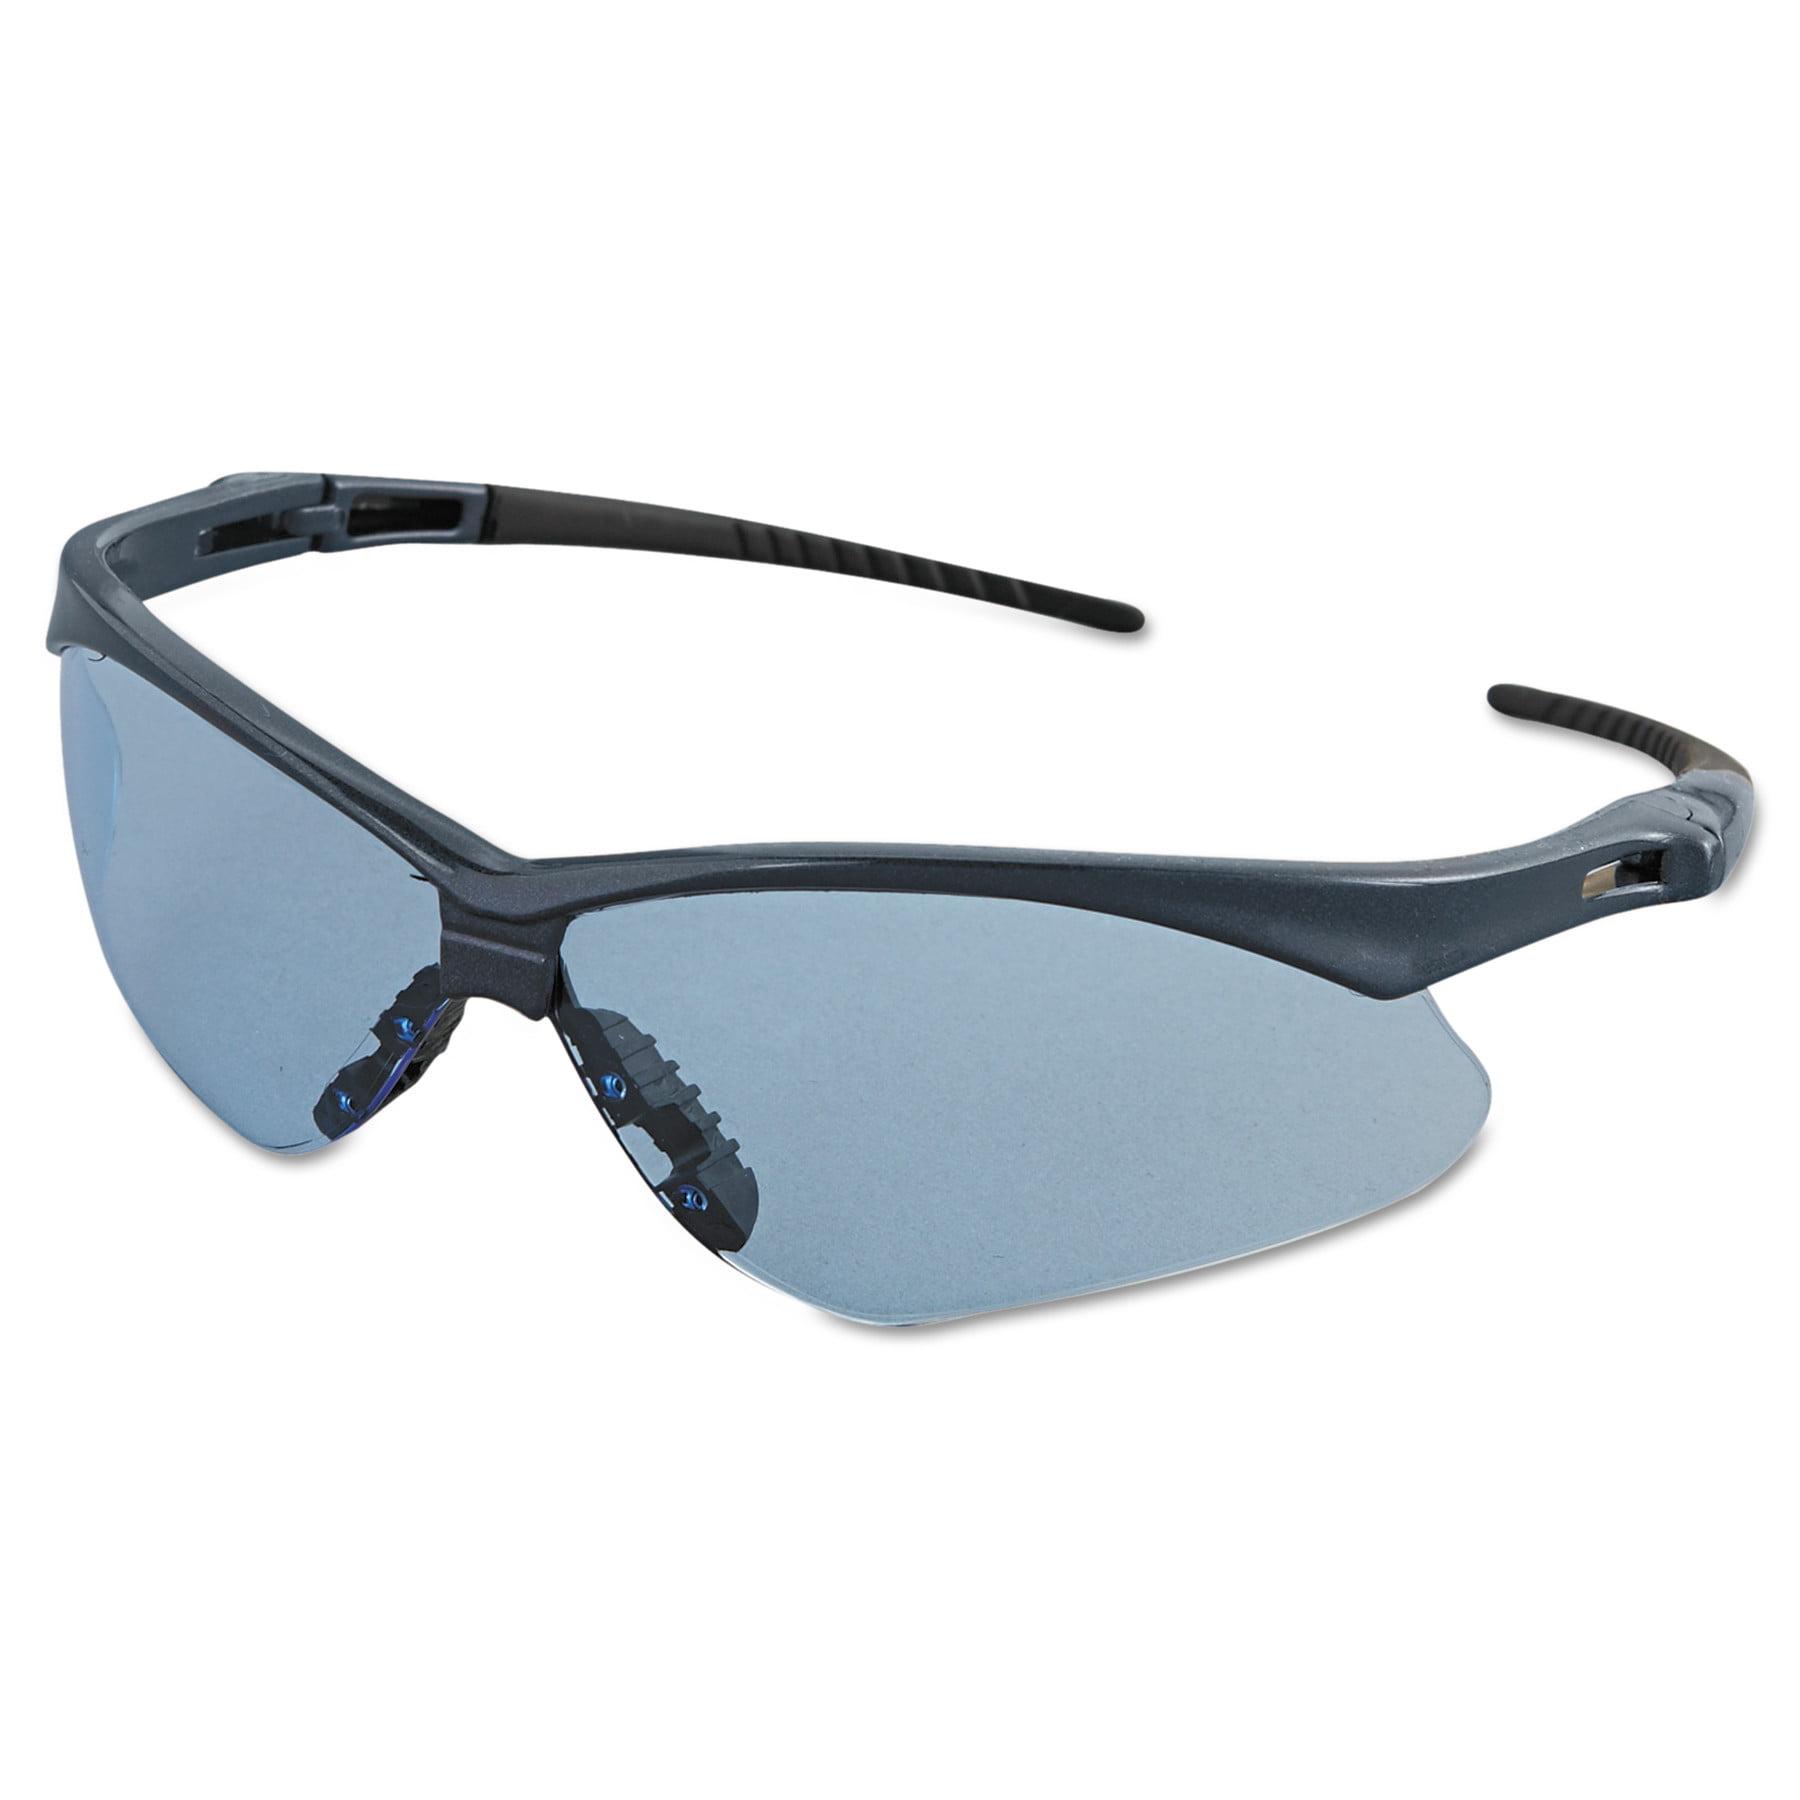 Jackson Safety* Nemesis Safety Glasses, Blue Frame, Light Blue Lens by Kimberly Clark